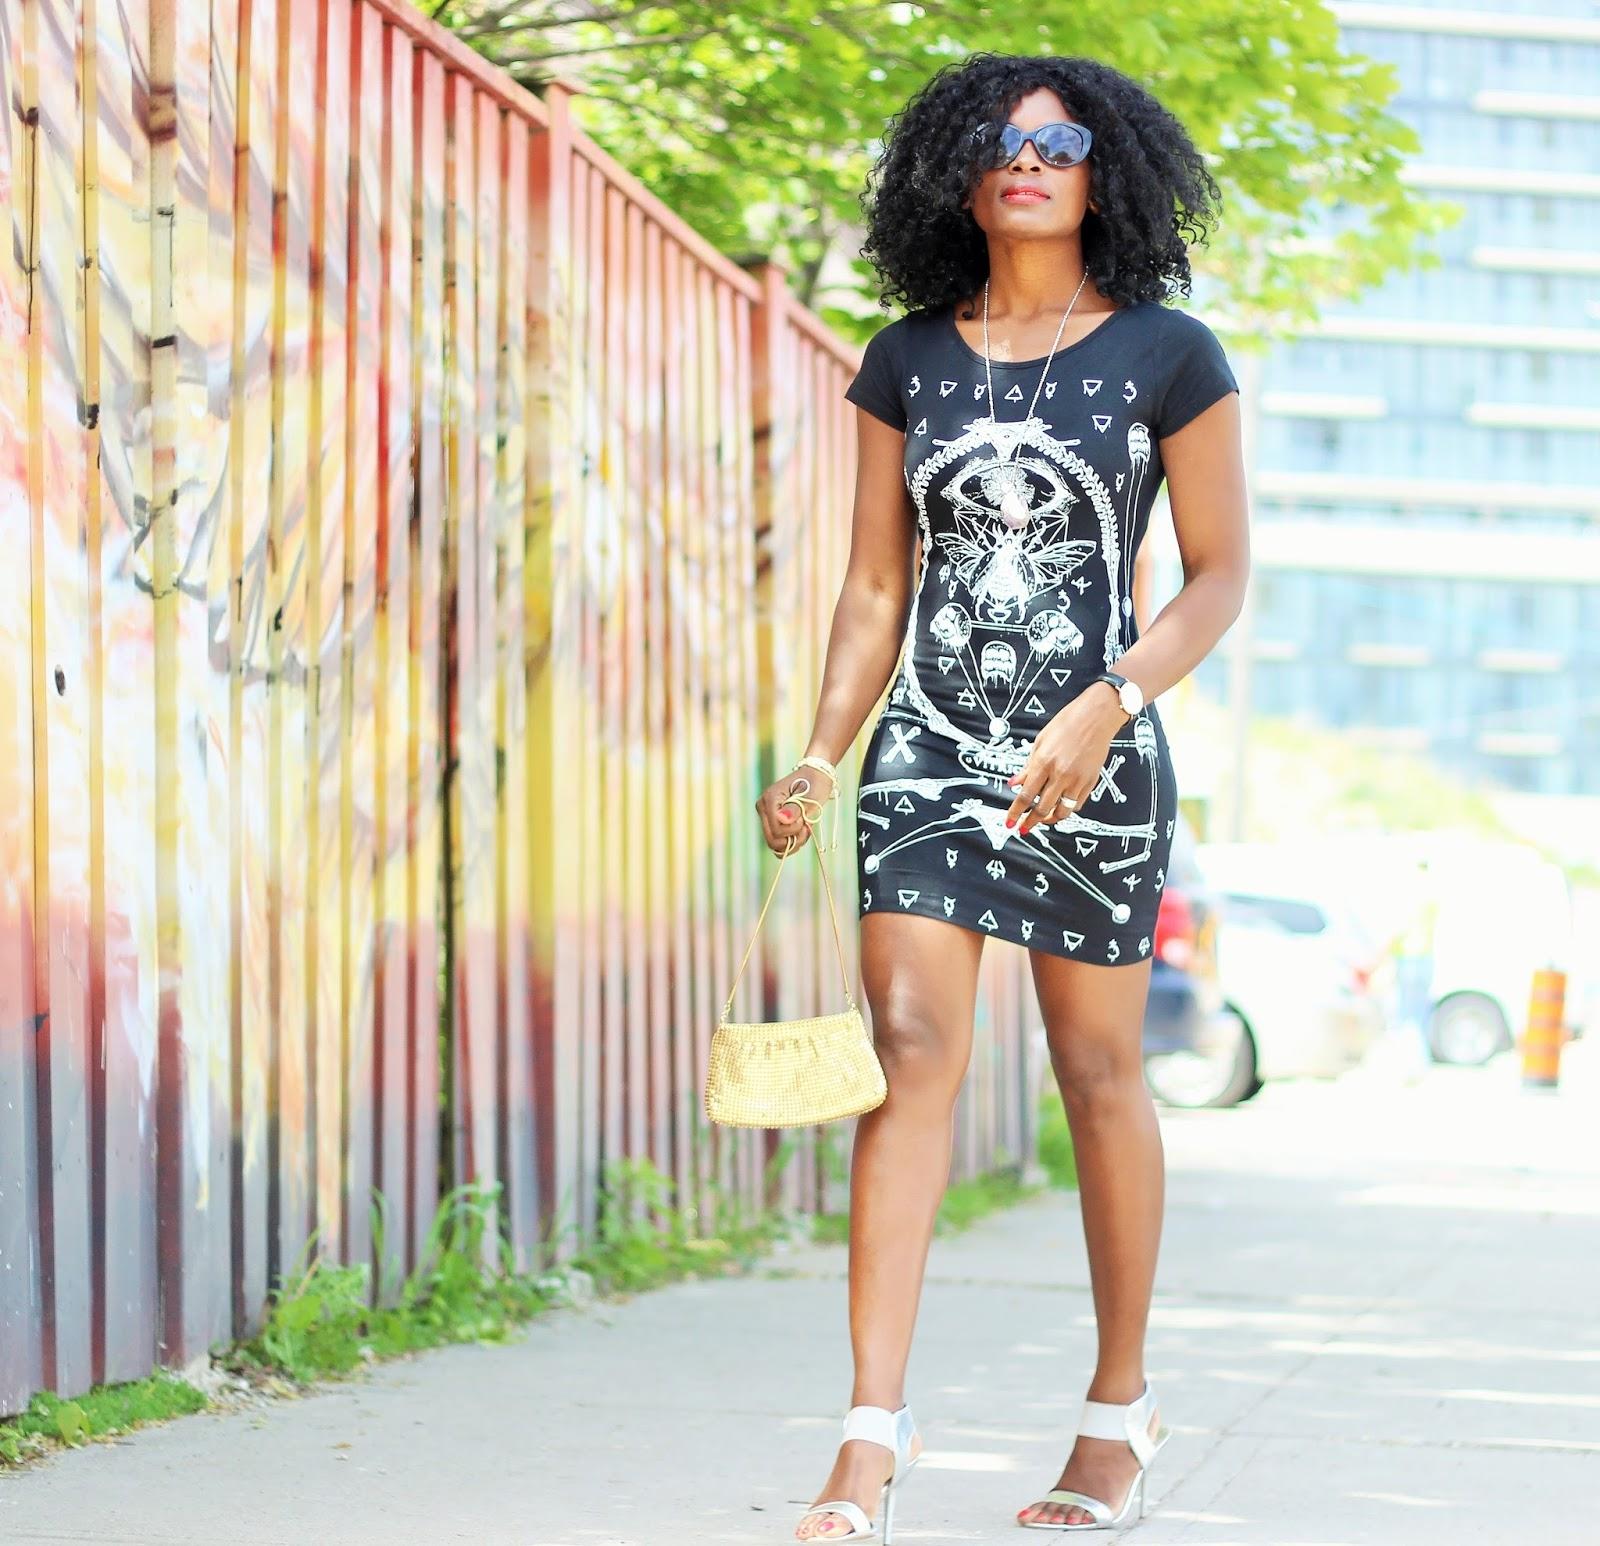 T-shirt dress by Jawbreaker Clothing